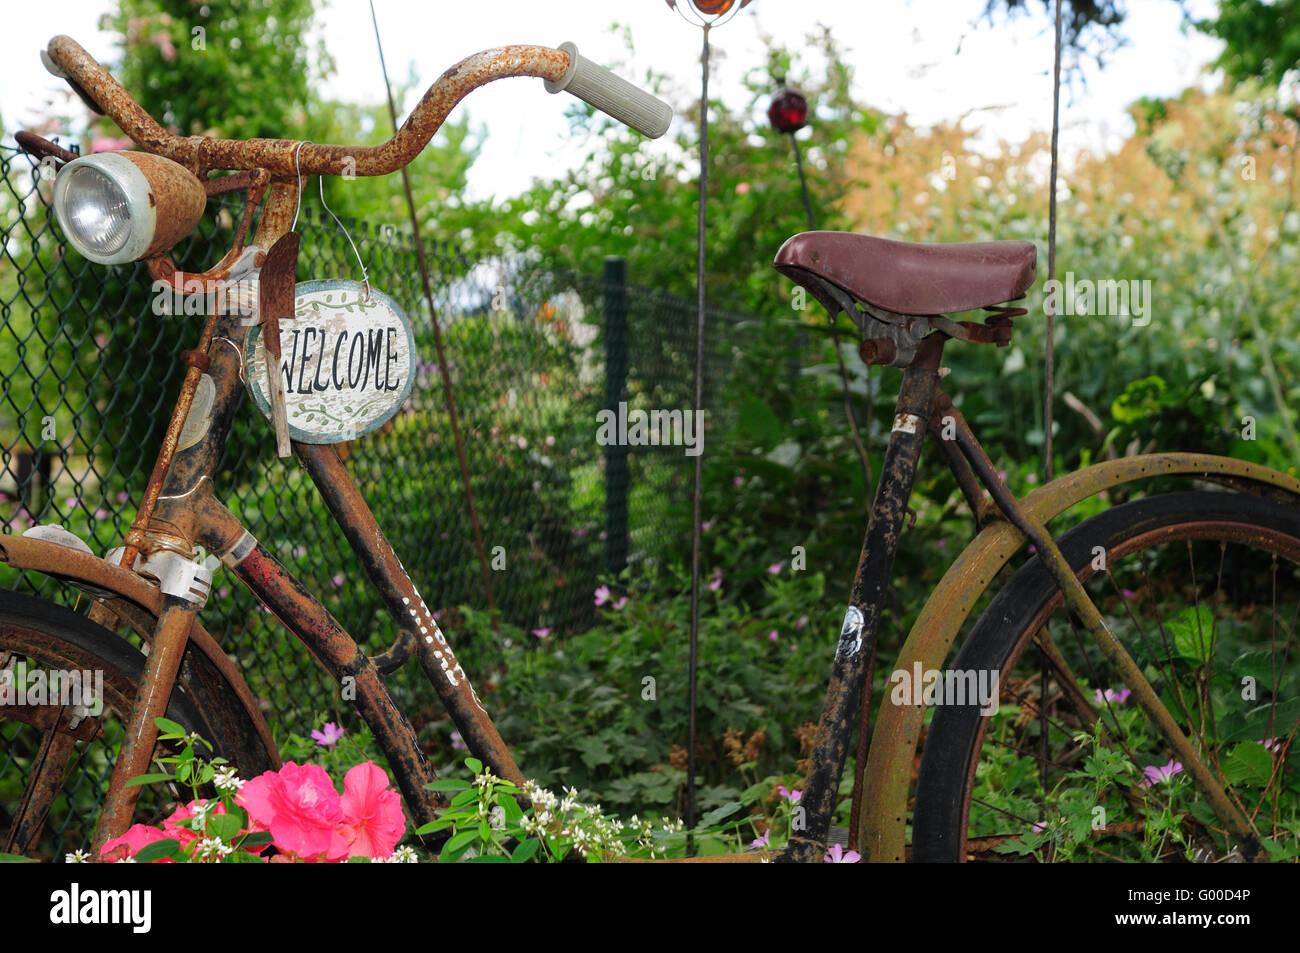 Altes fahrrad im garten stockfoto bild 103272534 alamy - Deko fahrrad garten ...